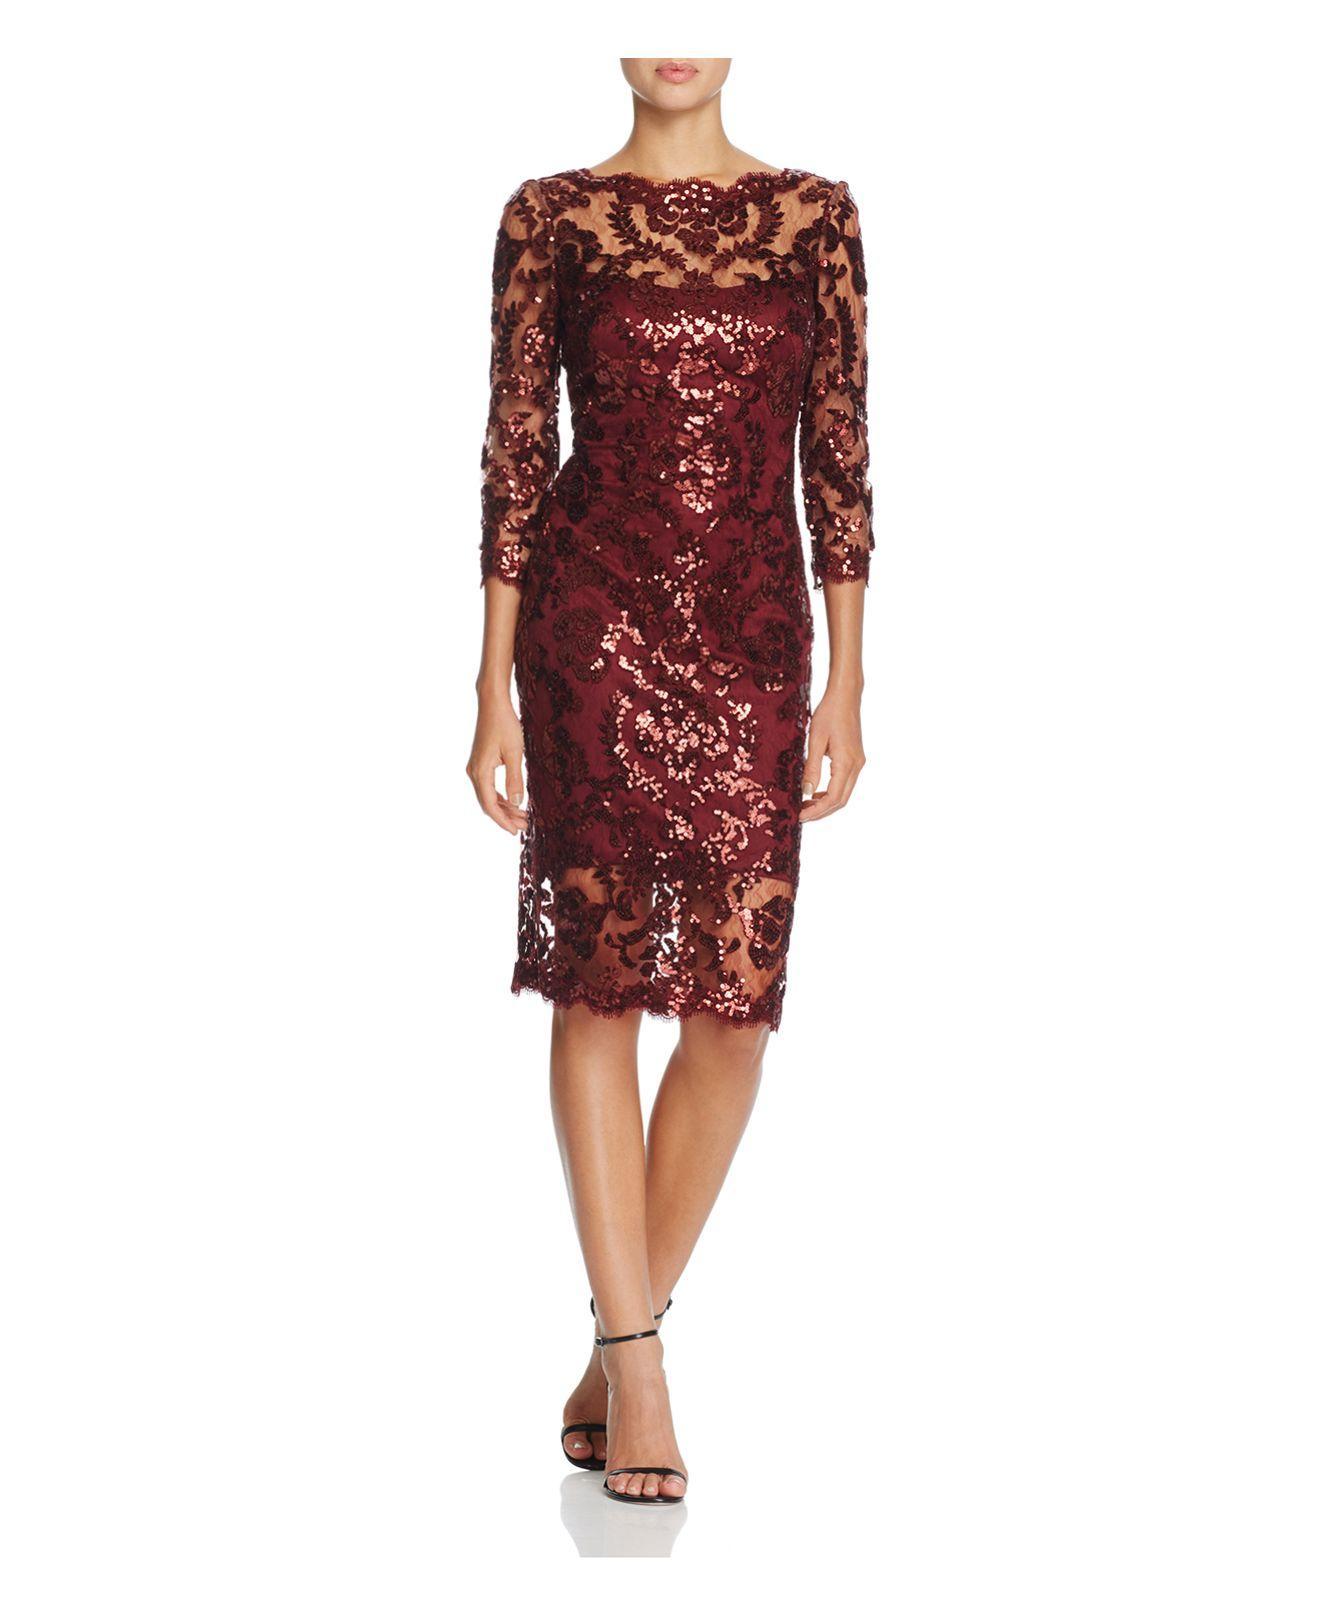 Tadashi Shoji Three Quarter Sleeve Sequin Lace Dress In